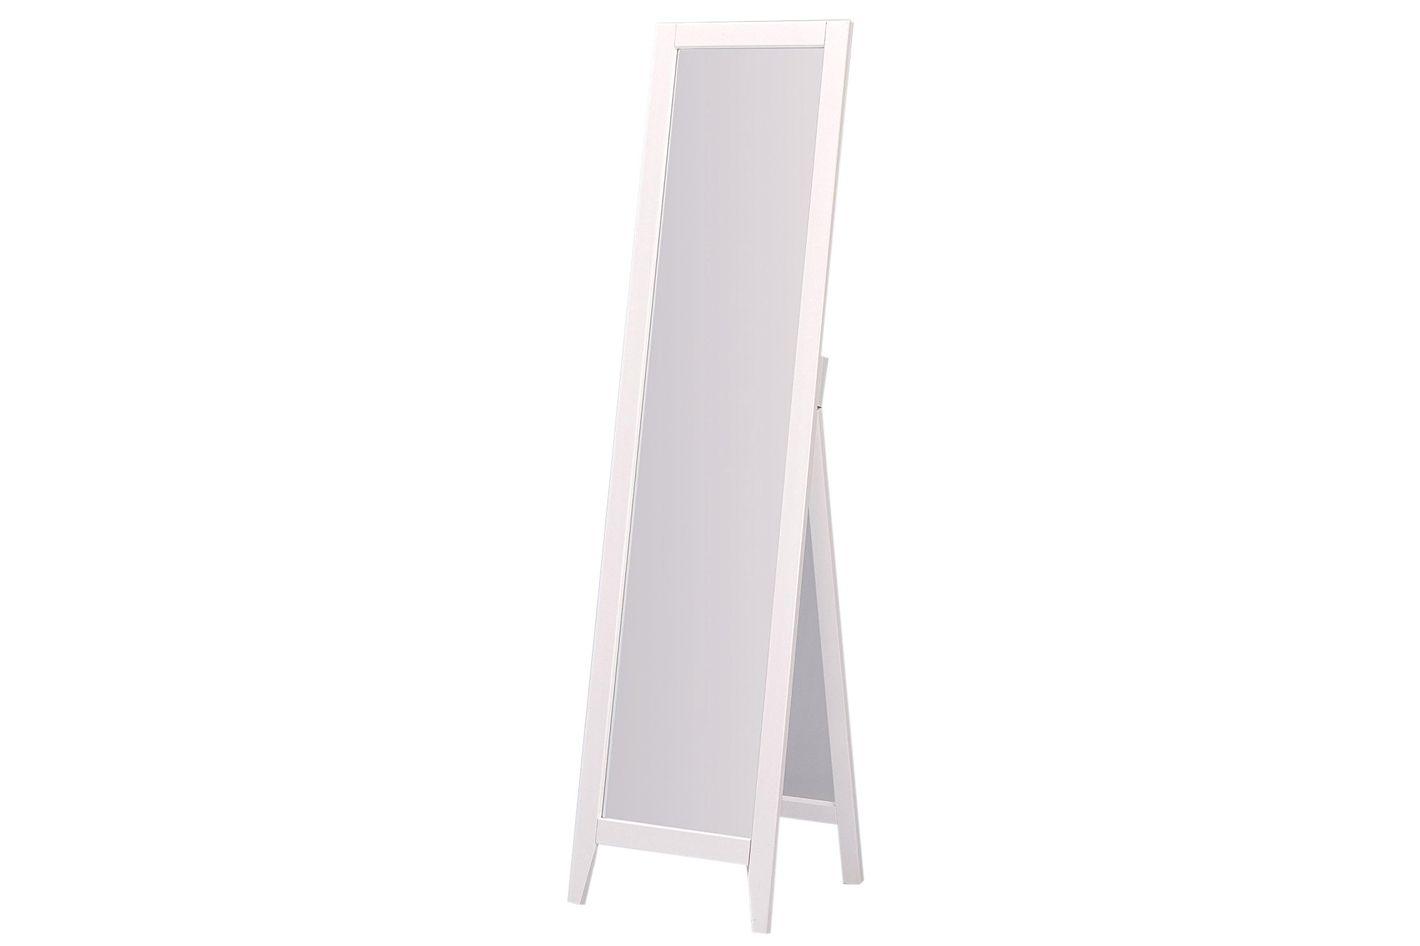 Full length white wall mirror